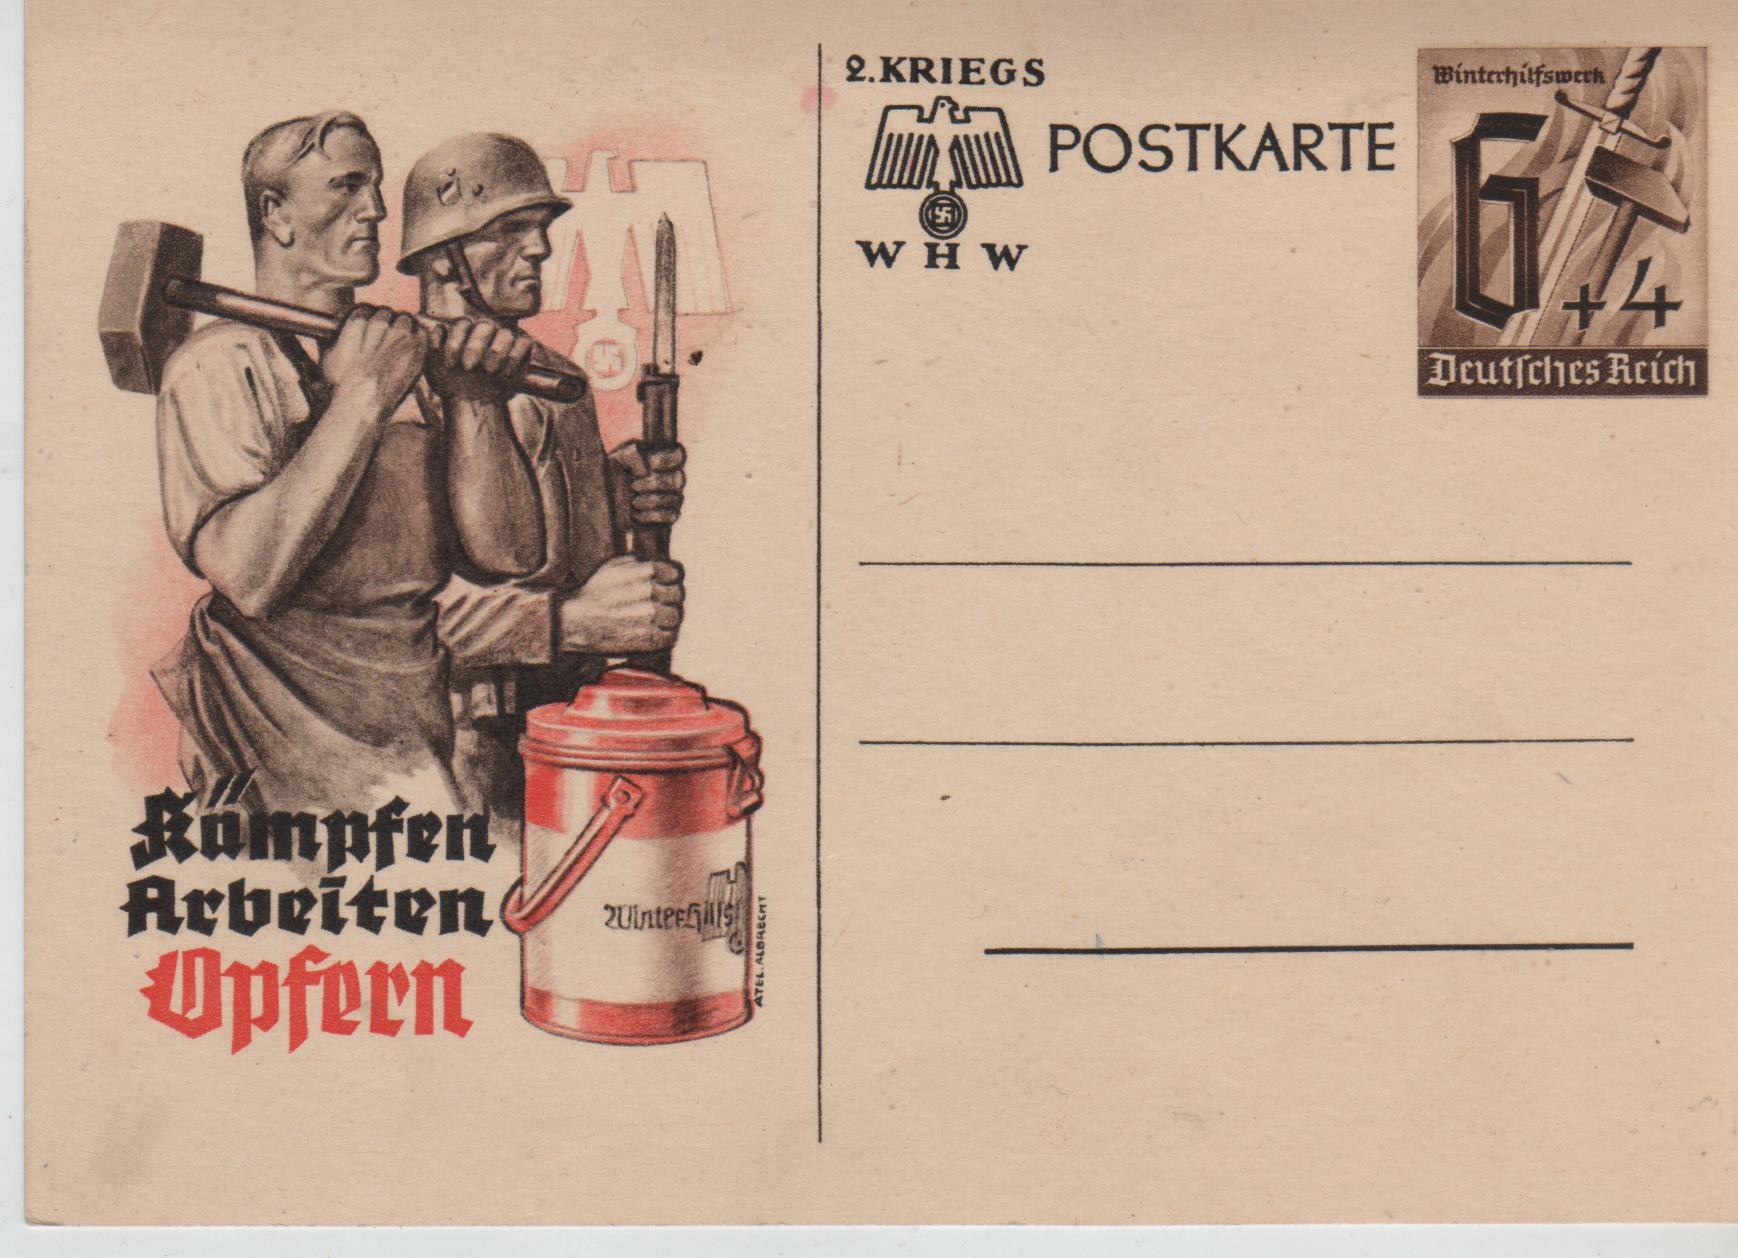 WHW - Postkarte